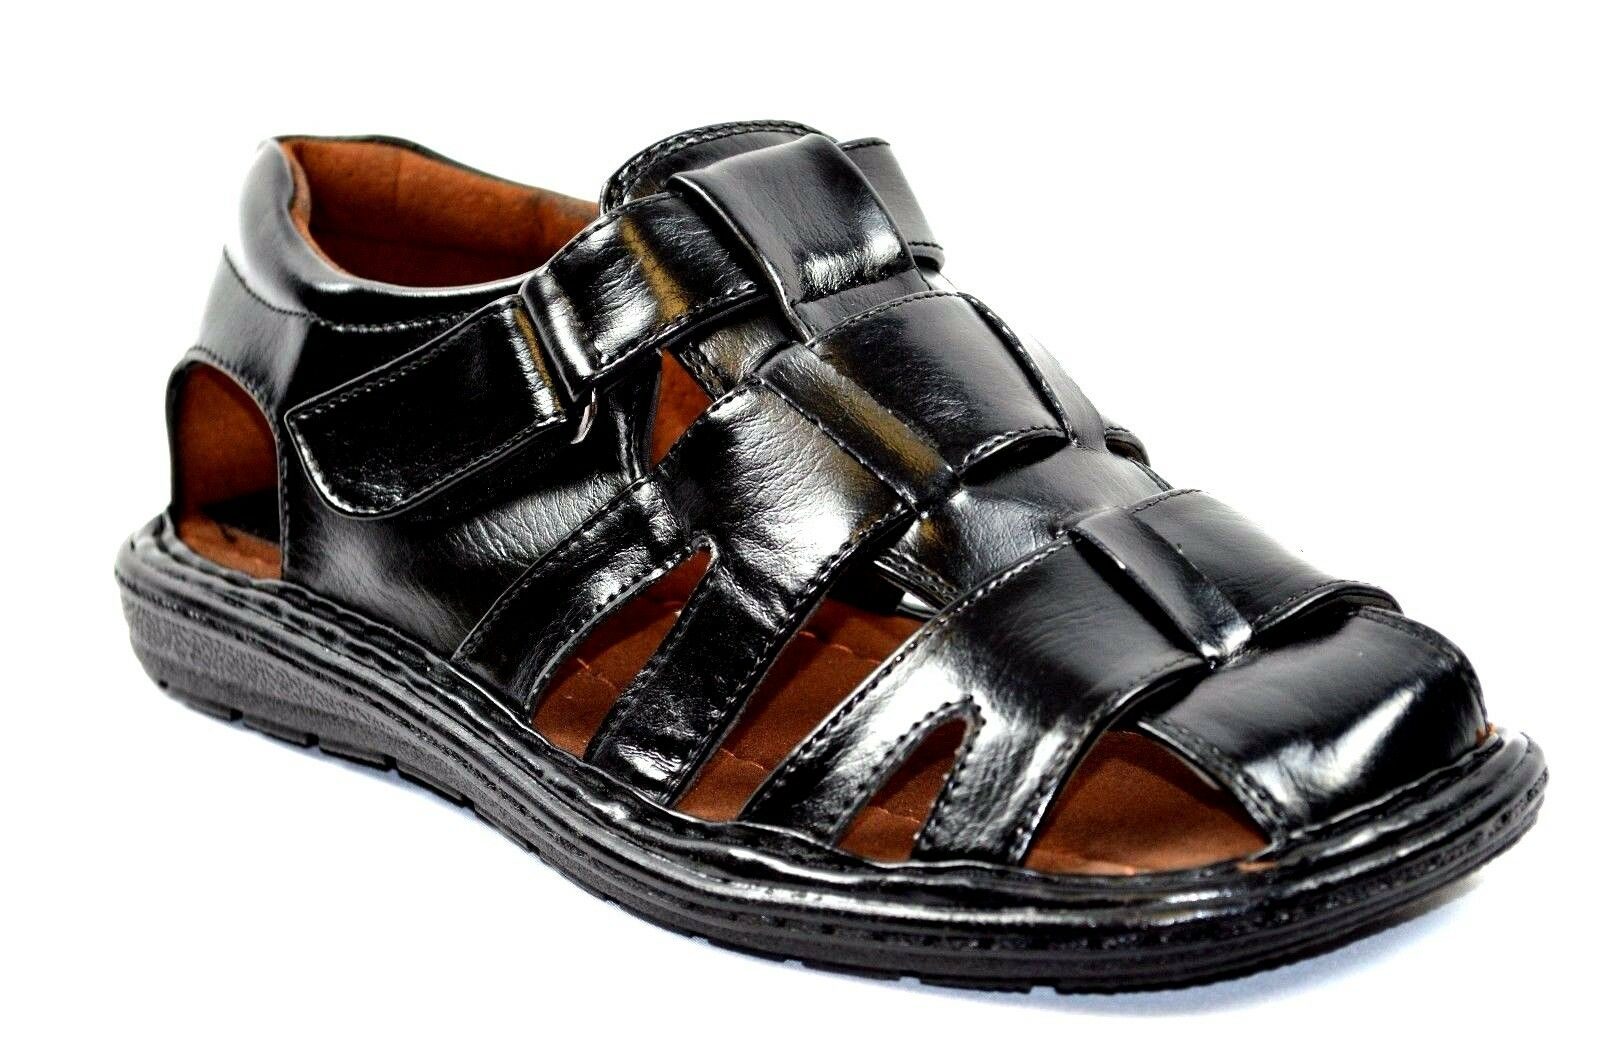 New  Fisherman Casual Casual Fisherman Sports Men Closed Toe Sandals Black or Brown-53 7b4e3c